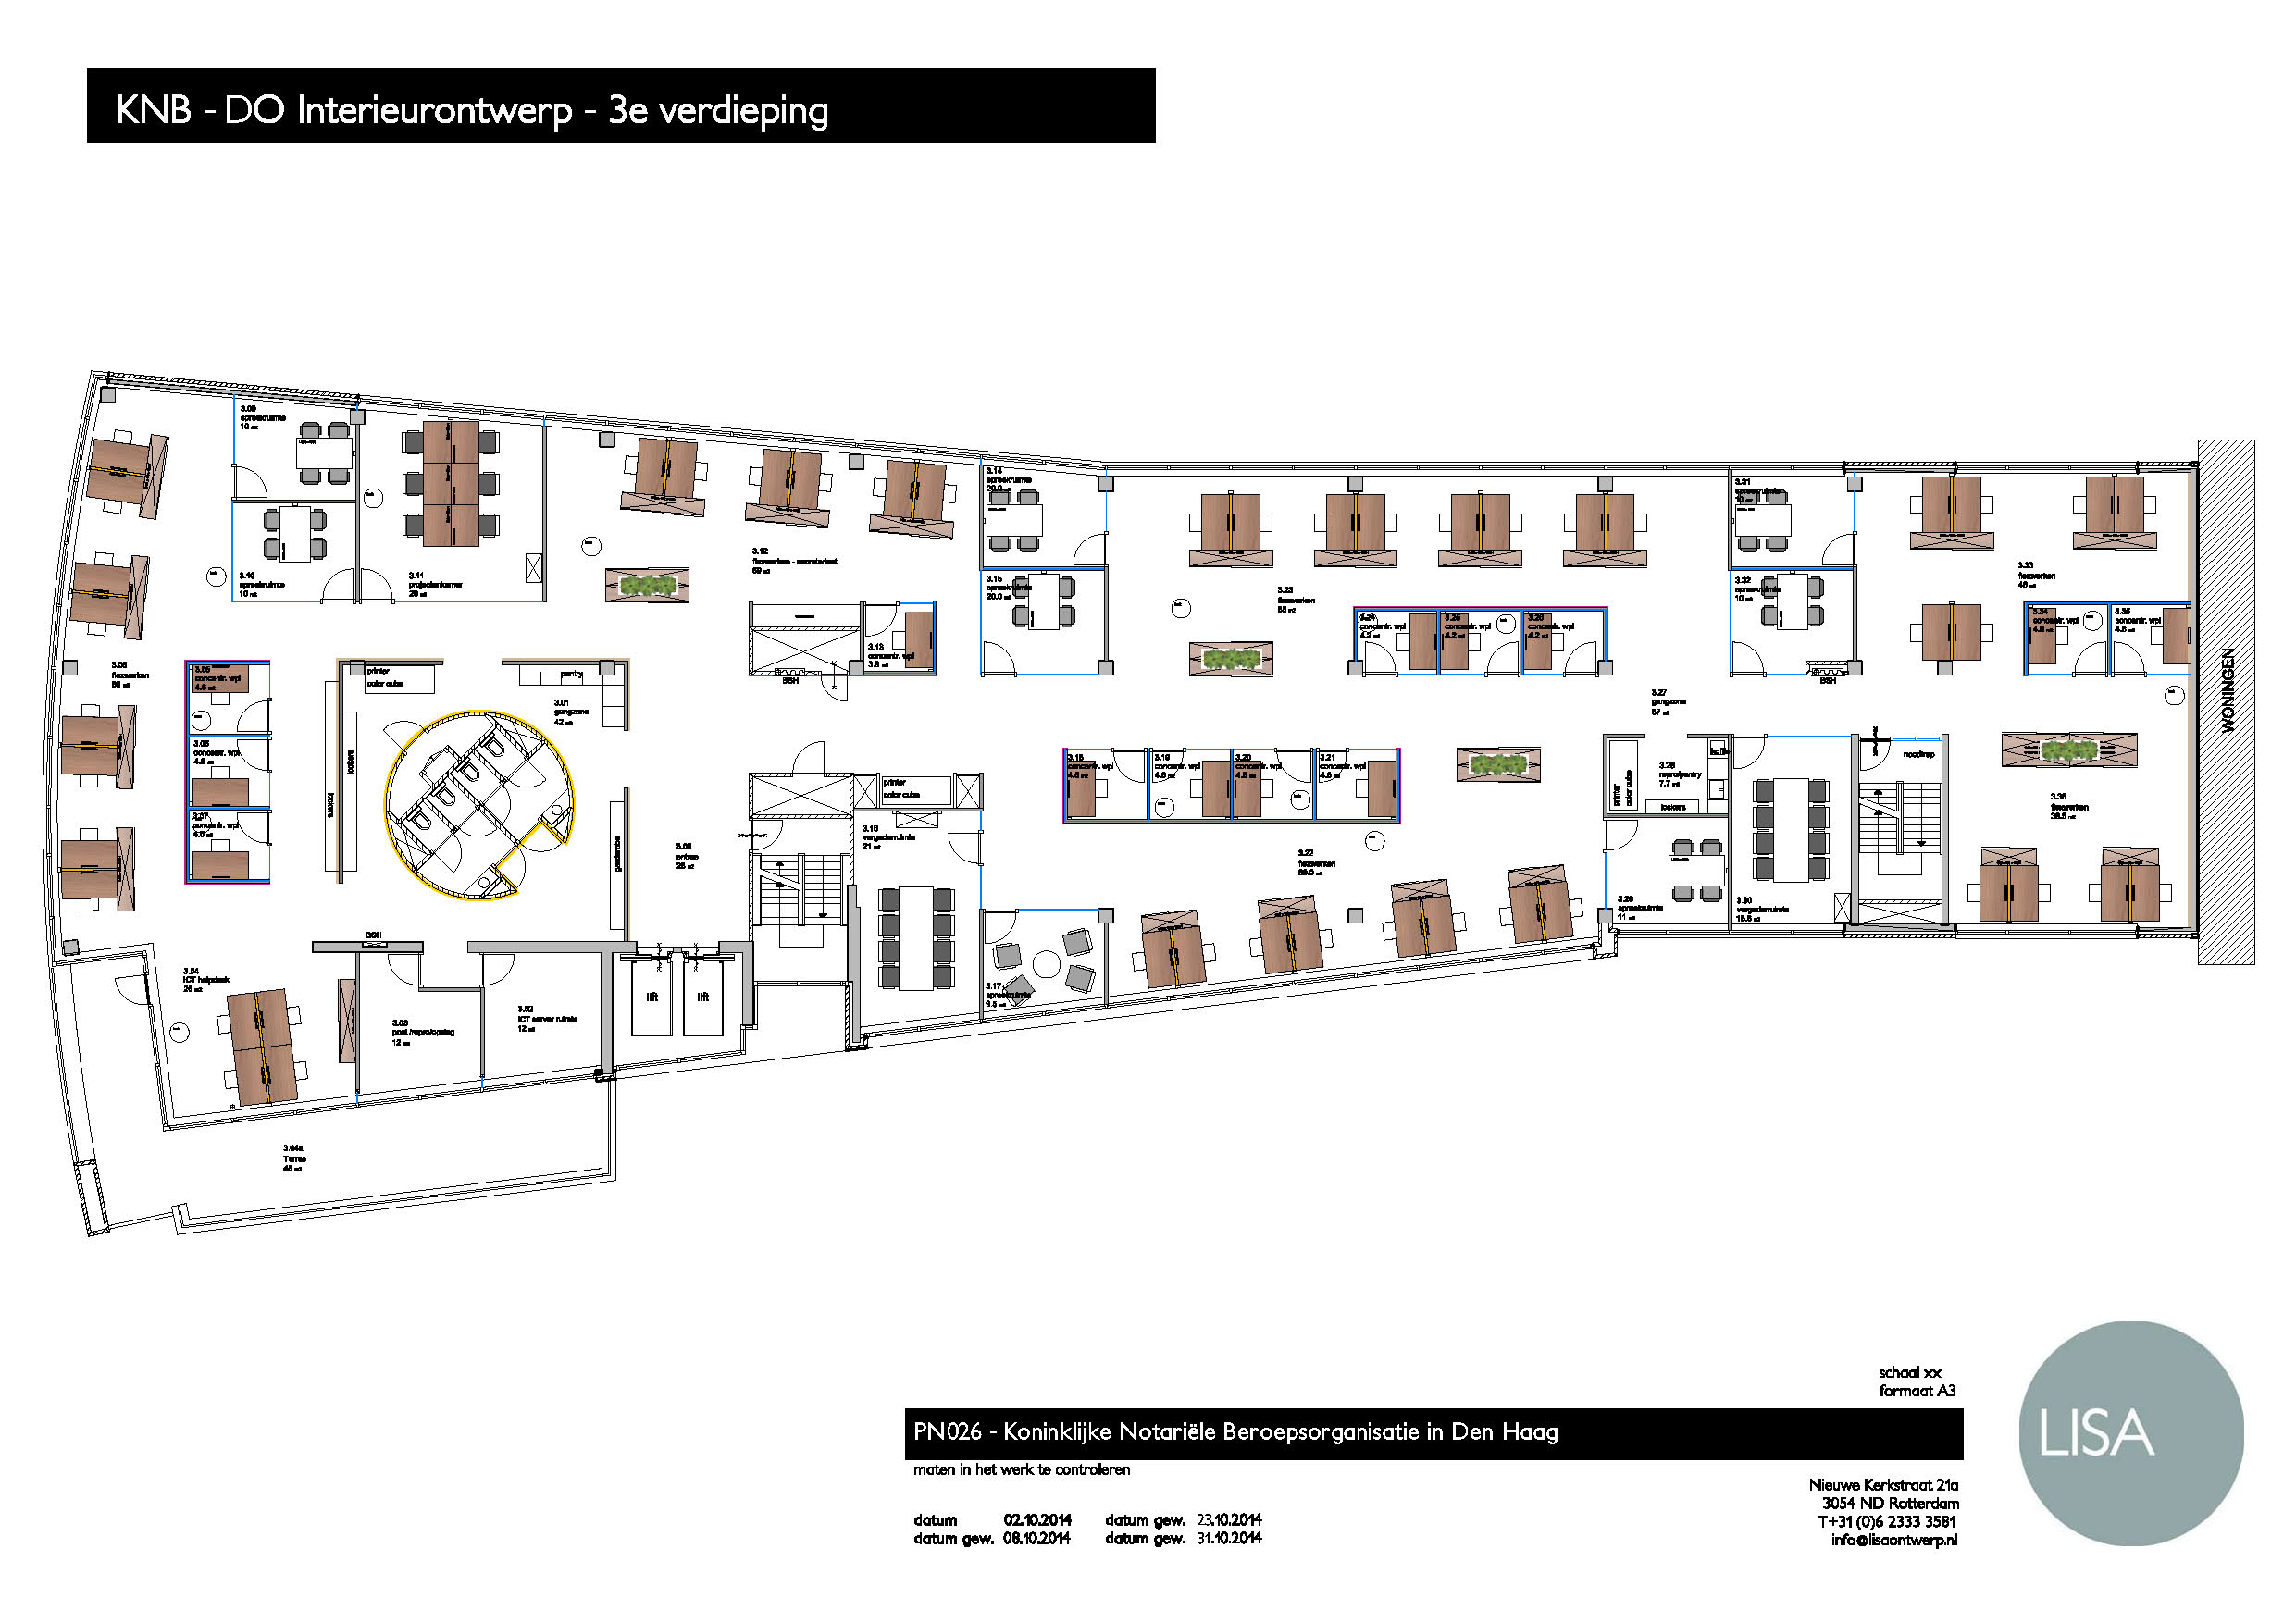 00 KNB - DO 3e Verdieping - meubilair - 31102014.jpg